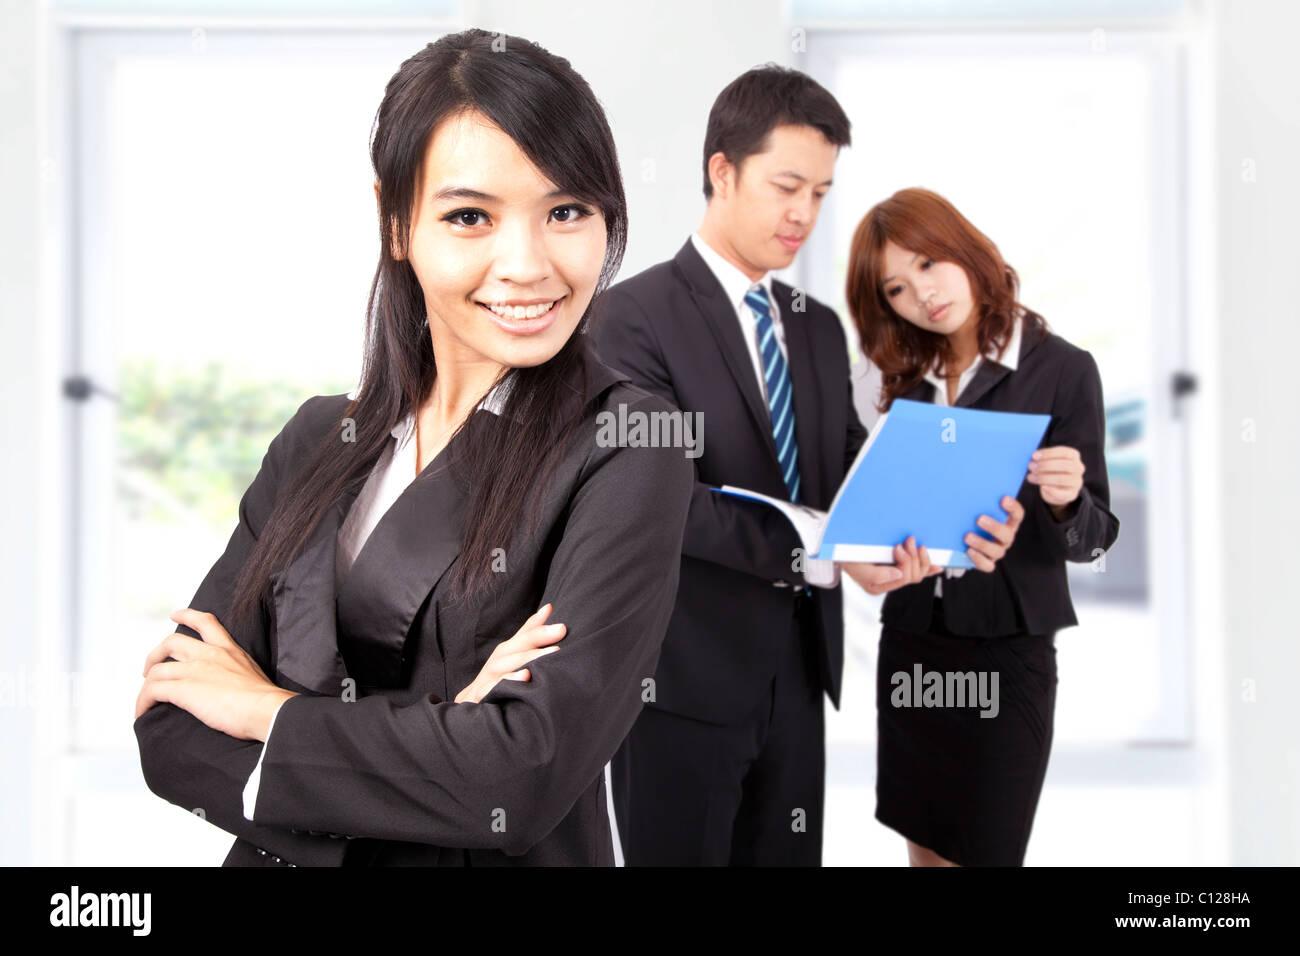 Les jeunes et smiling business woman in an office Photo Stock